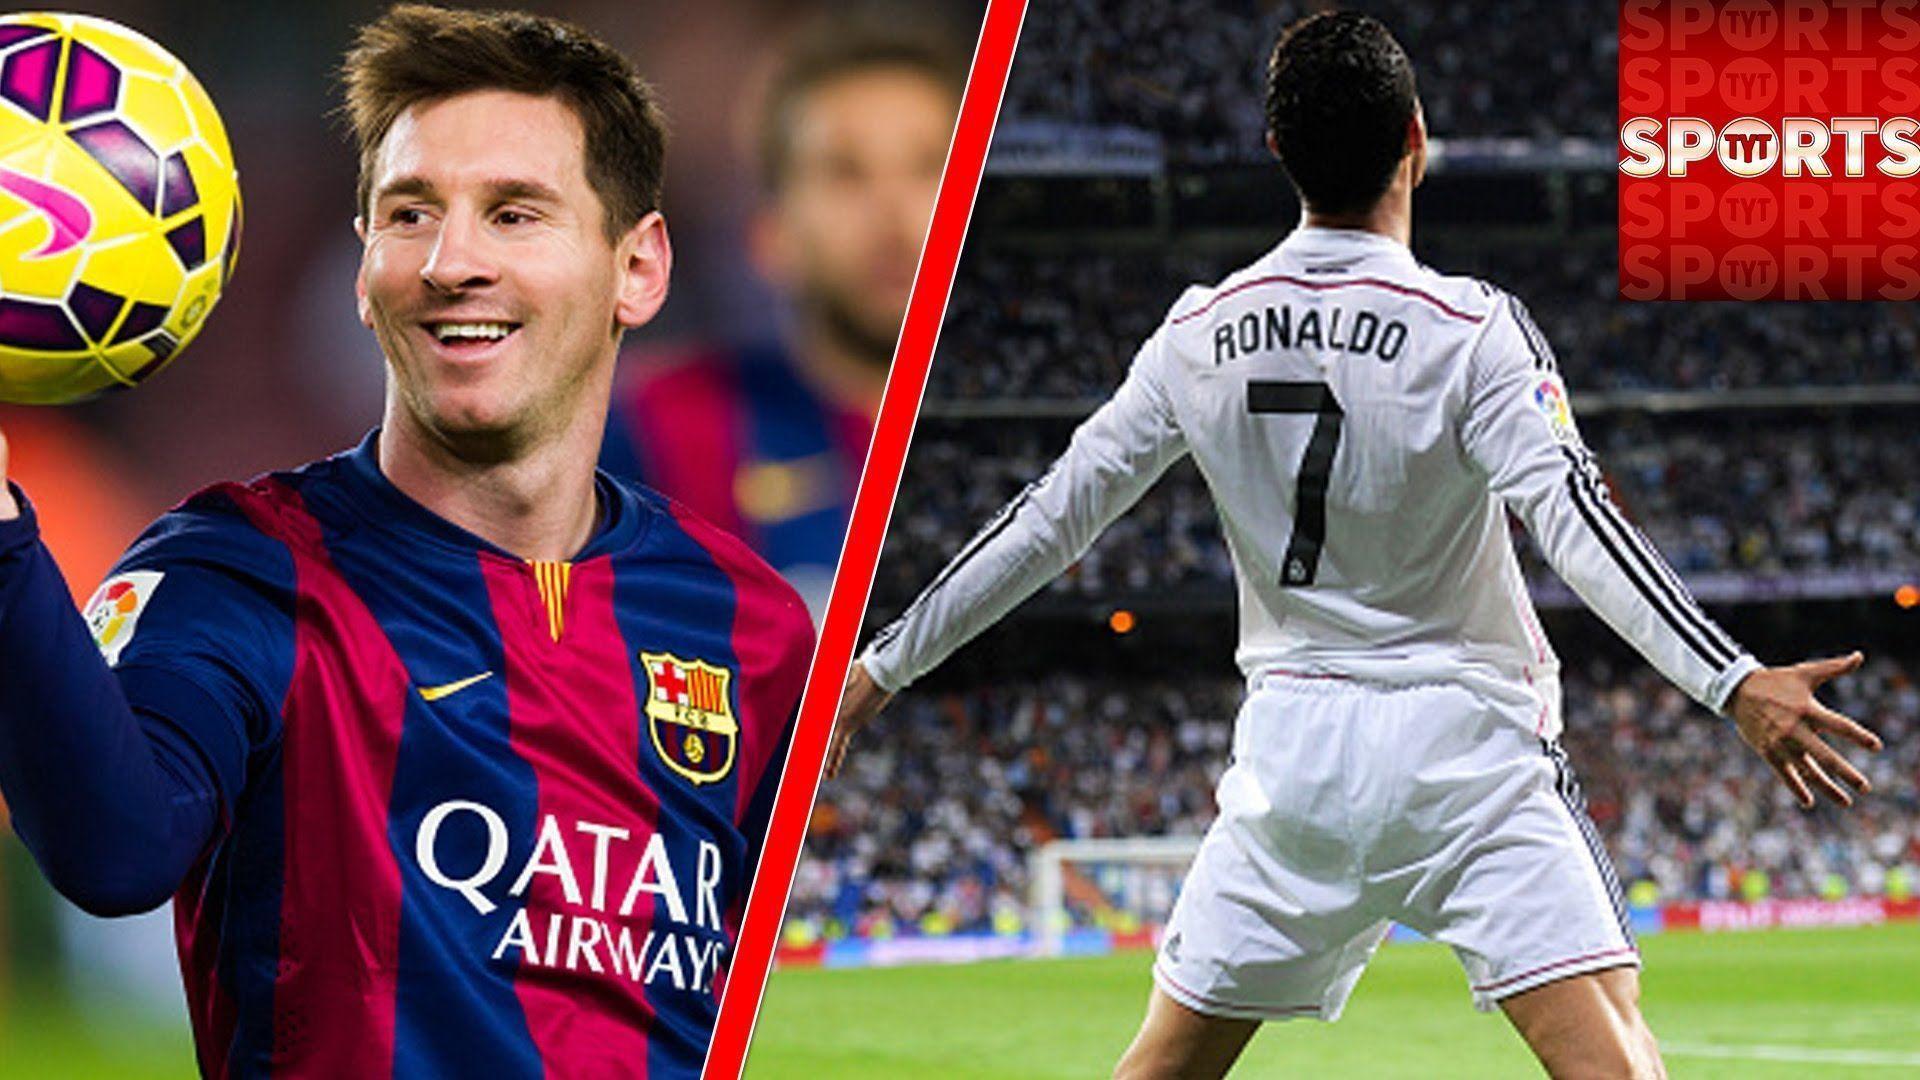 Ronaldo will score more goals than Messi in new season